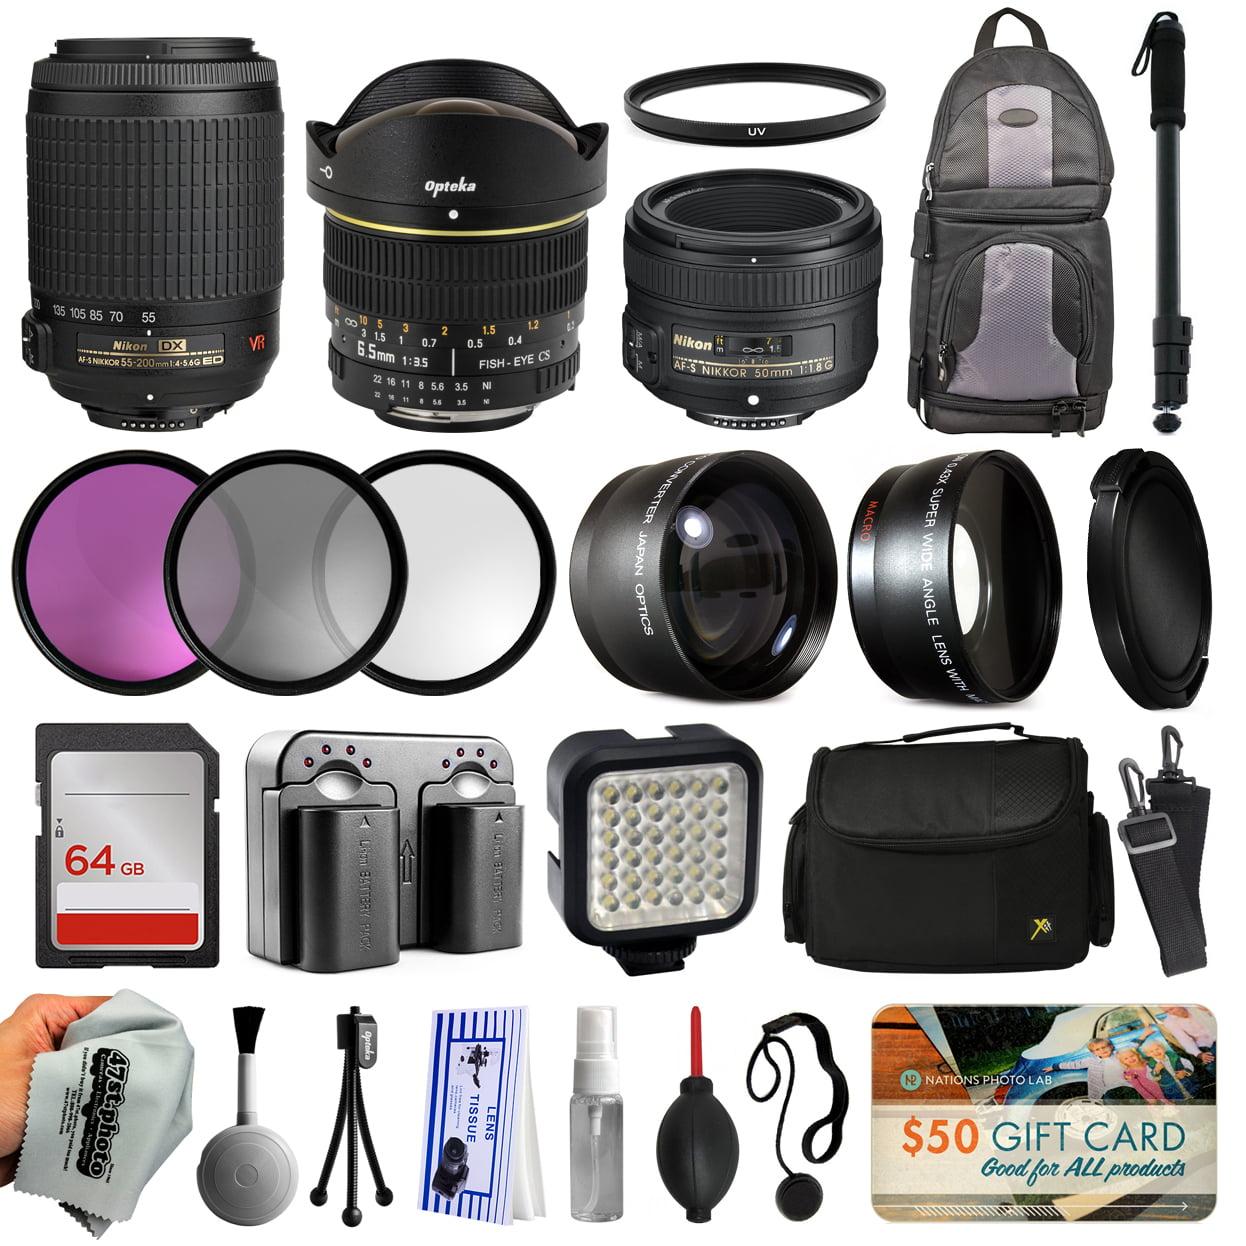 Opteka Ultimate Lens Accessory Bundle with Nikon VR 55-20...